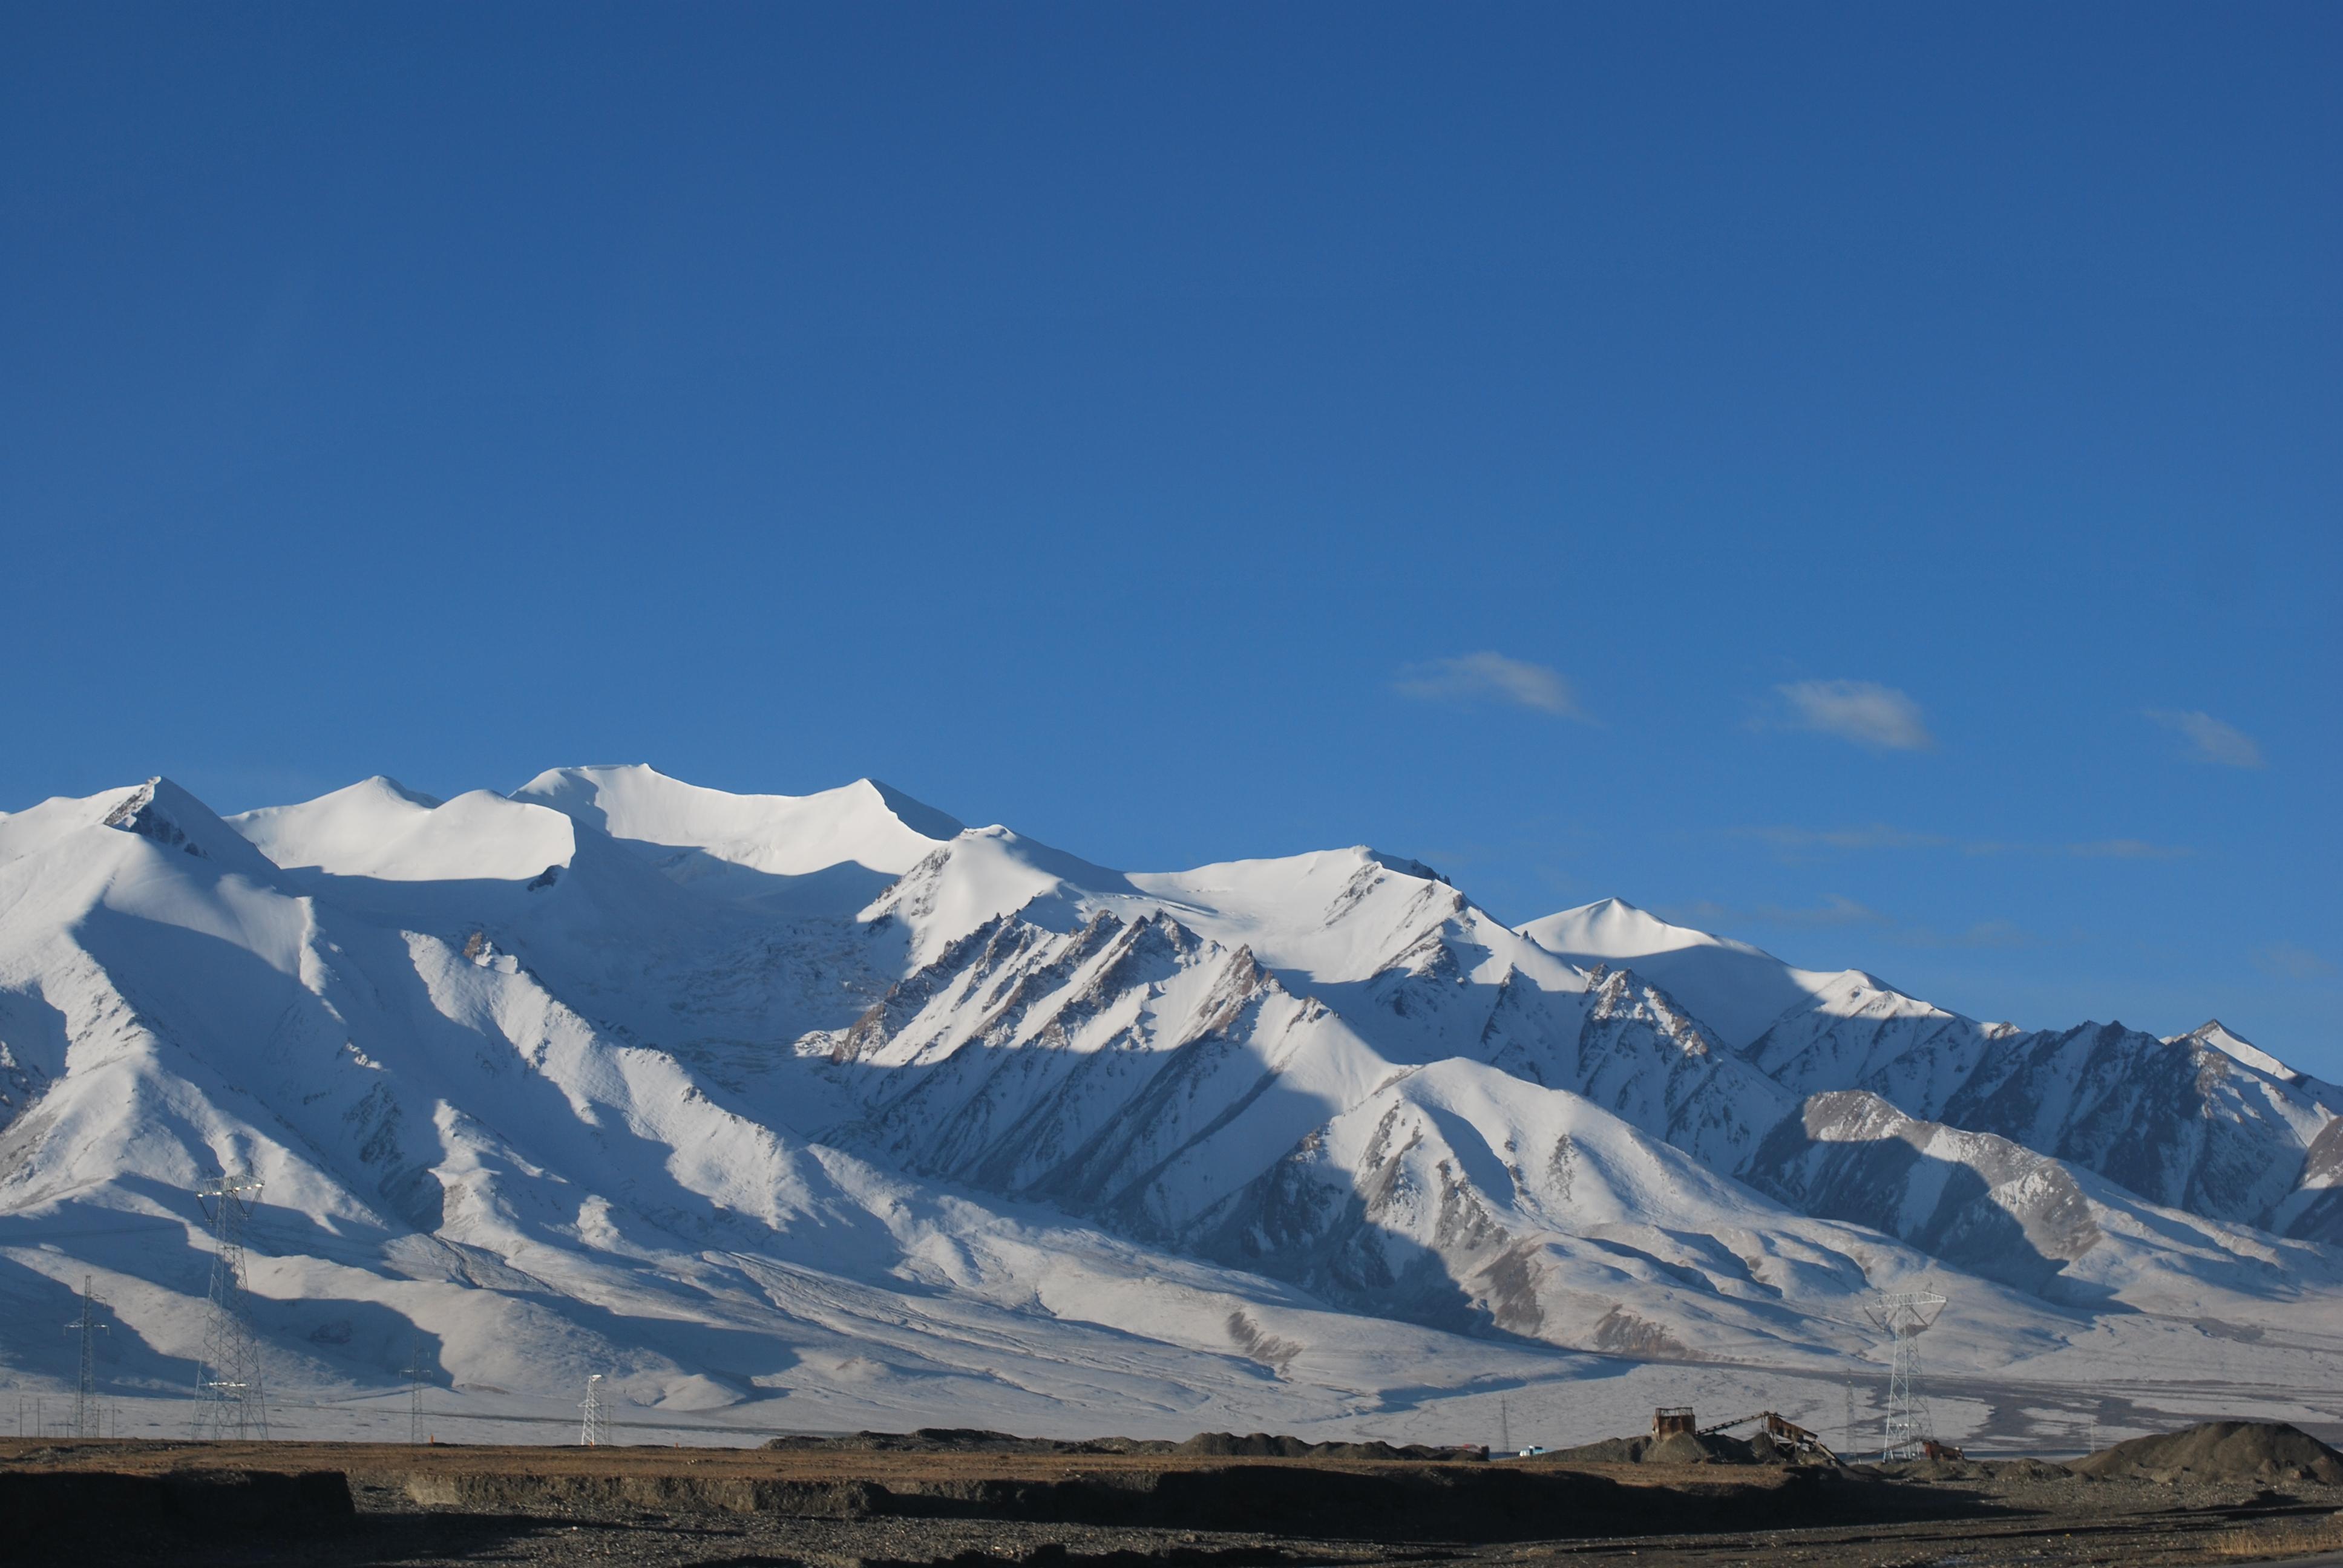 File:Golmud, Haixi, Qinghai, China - panoramio.jpg ...